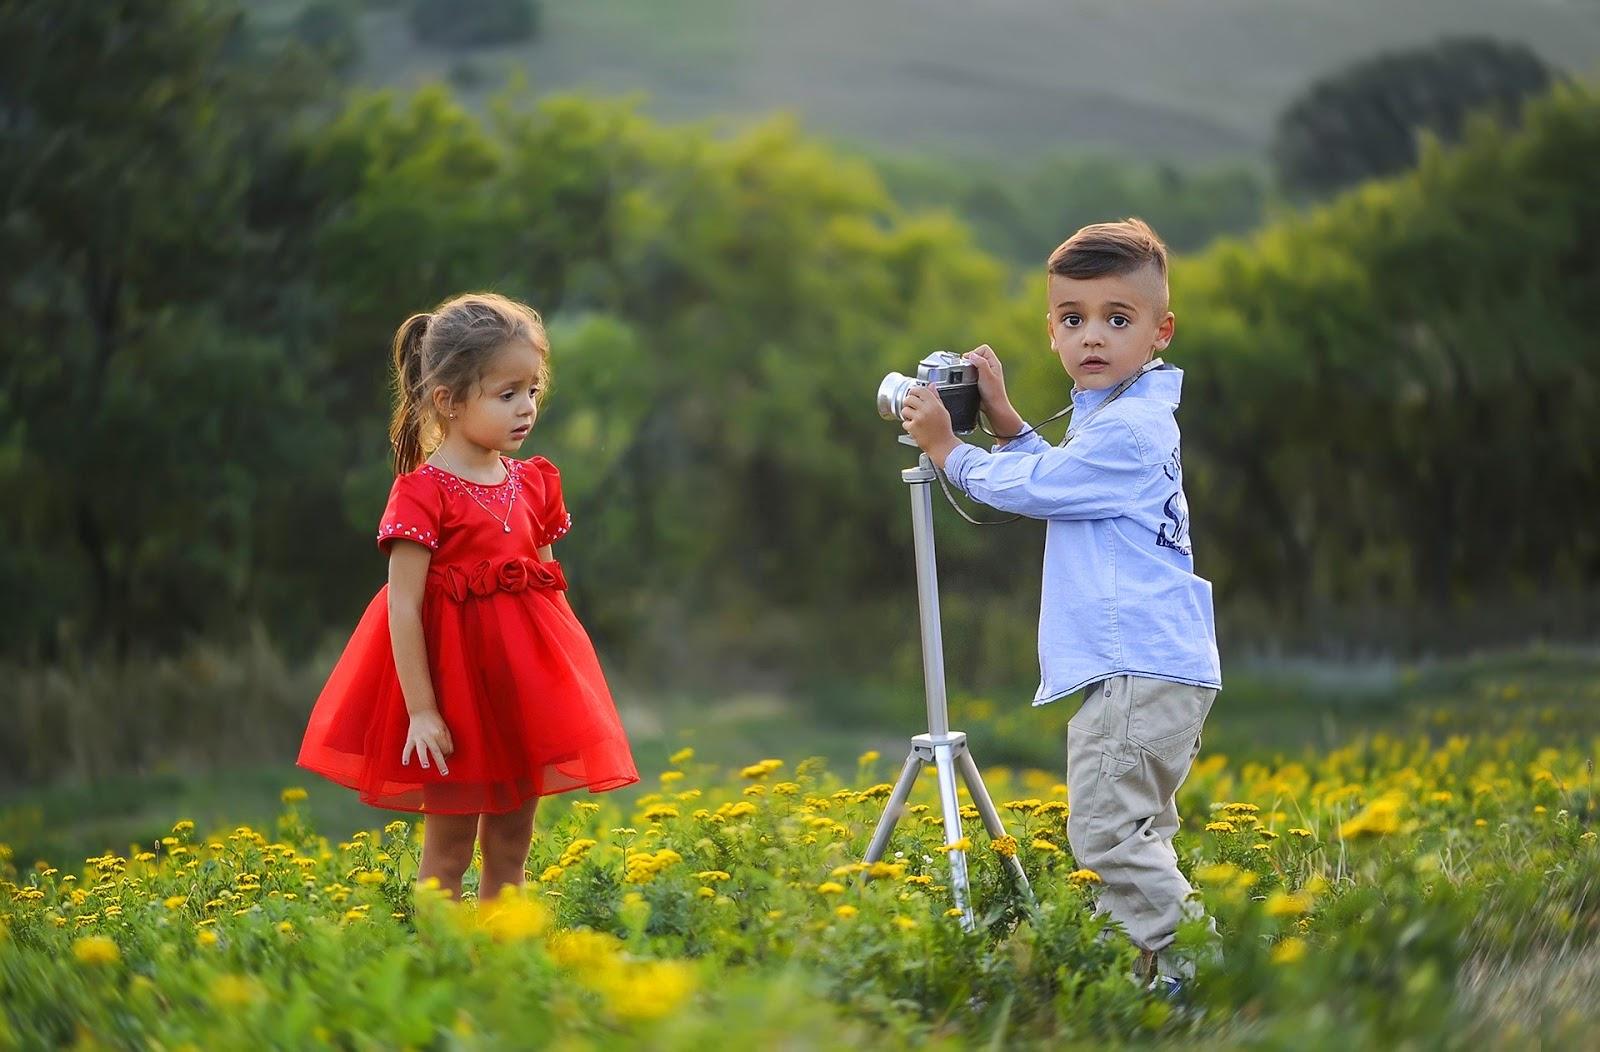 Cute Boys Girls Whatsapp DP Images 1 1